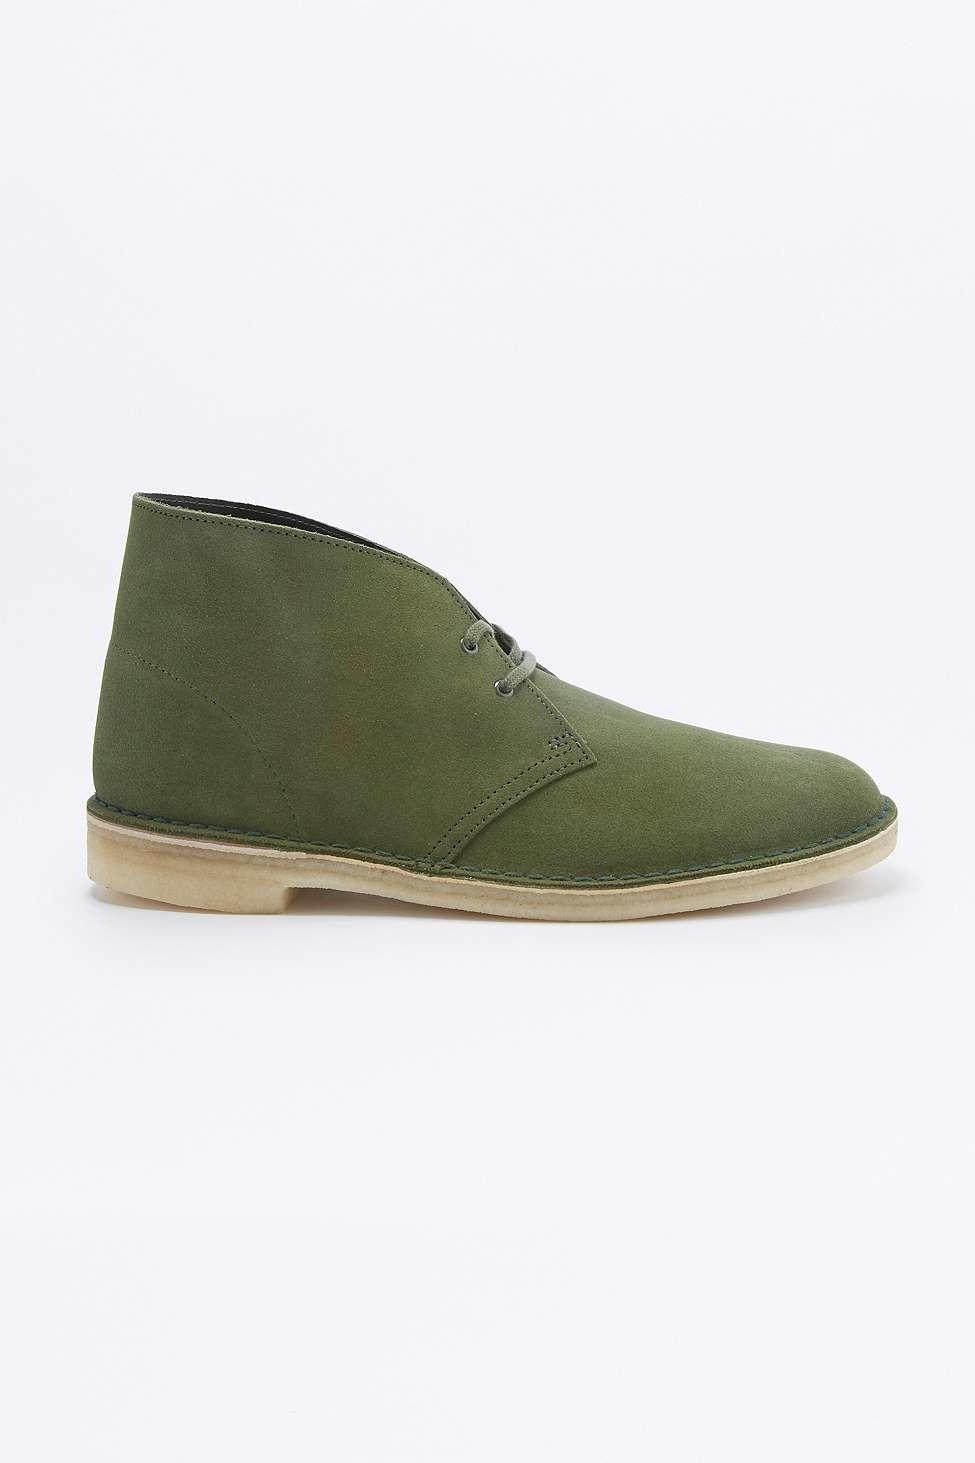 Clarks Leaf Green Suede Desert Boots In Green For Men Lyst